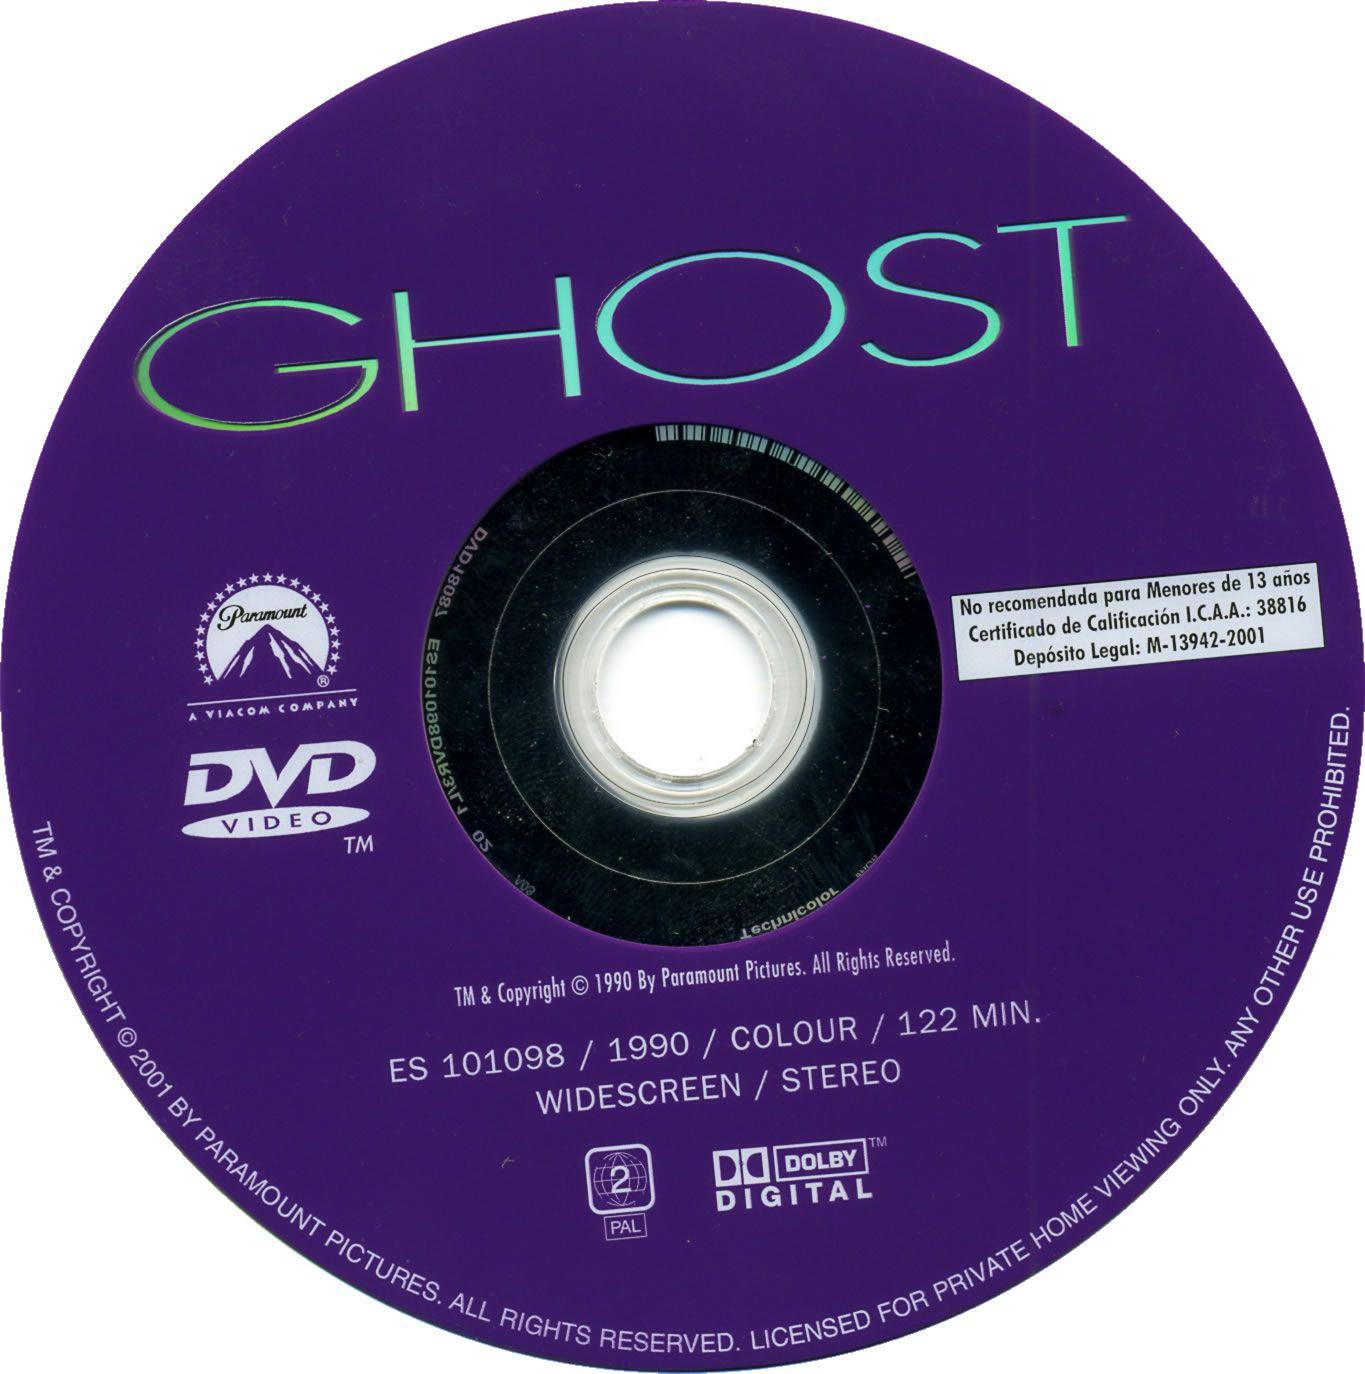 http://4.bp.blogspot.com/_FN7dlH54yBQ/S_oJQL5fKfI/AAAAAAAACrU/ViElKJXyEVA/s1600/Ghost+CD.jpg